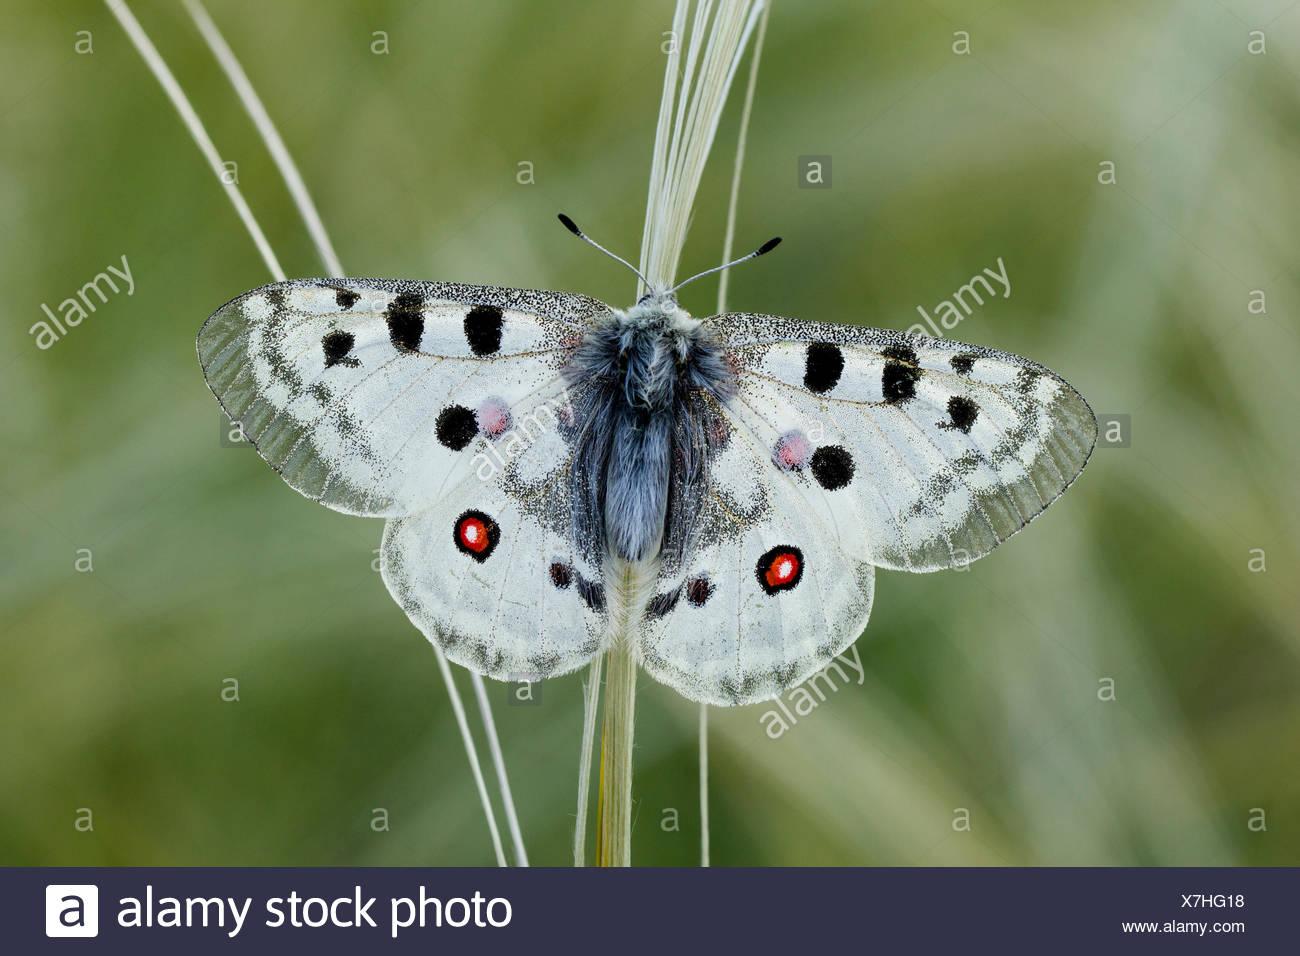 Animal, Insect, Butterfly, Papilionidae, Apollo, Parnassius apollo, Lepidoptera, Switzerland - Stock Image